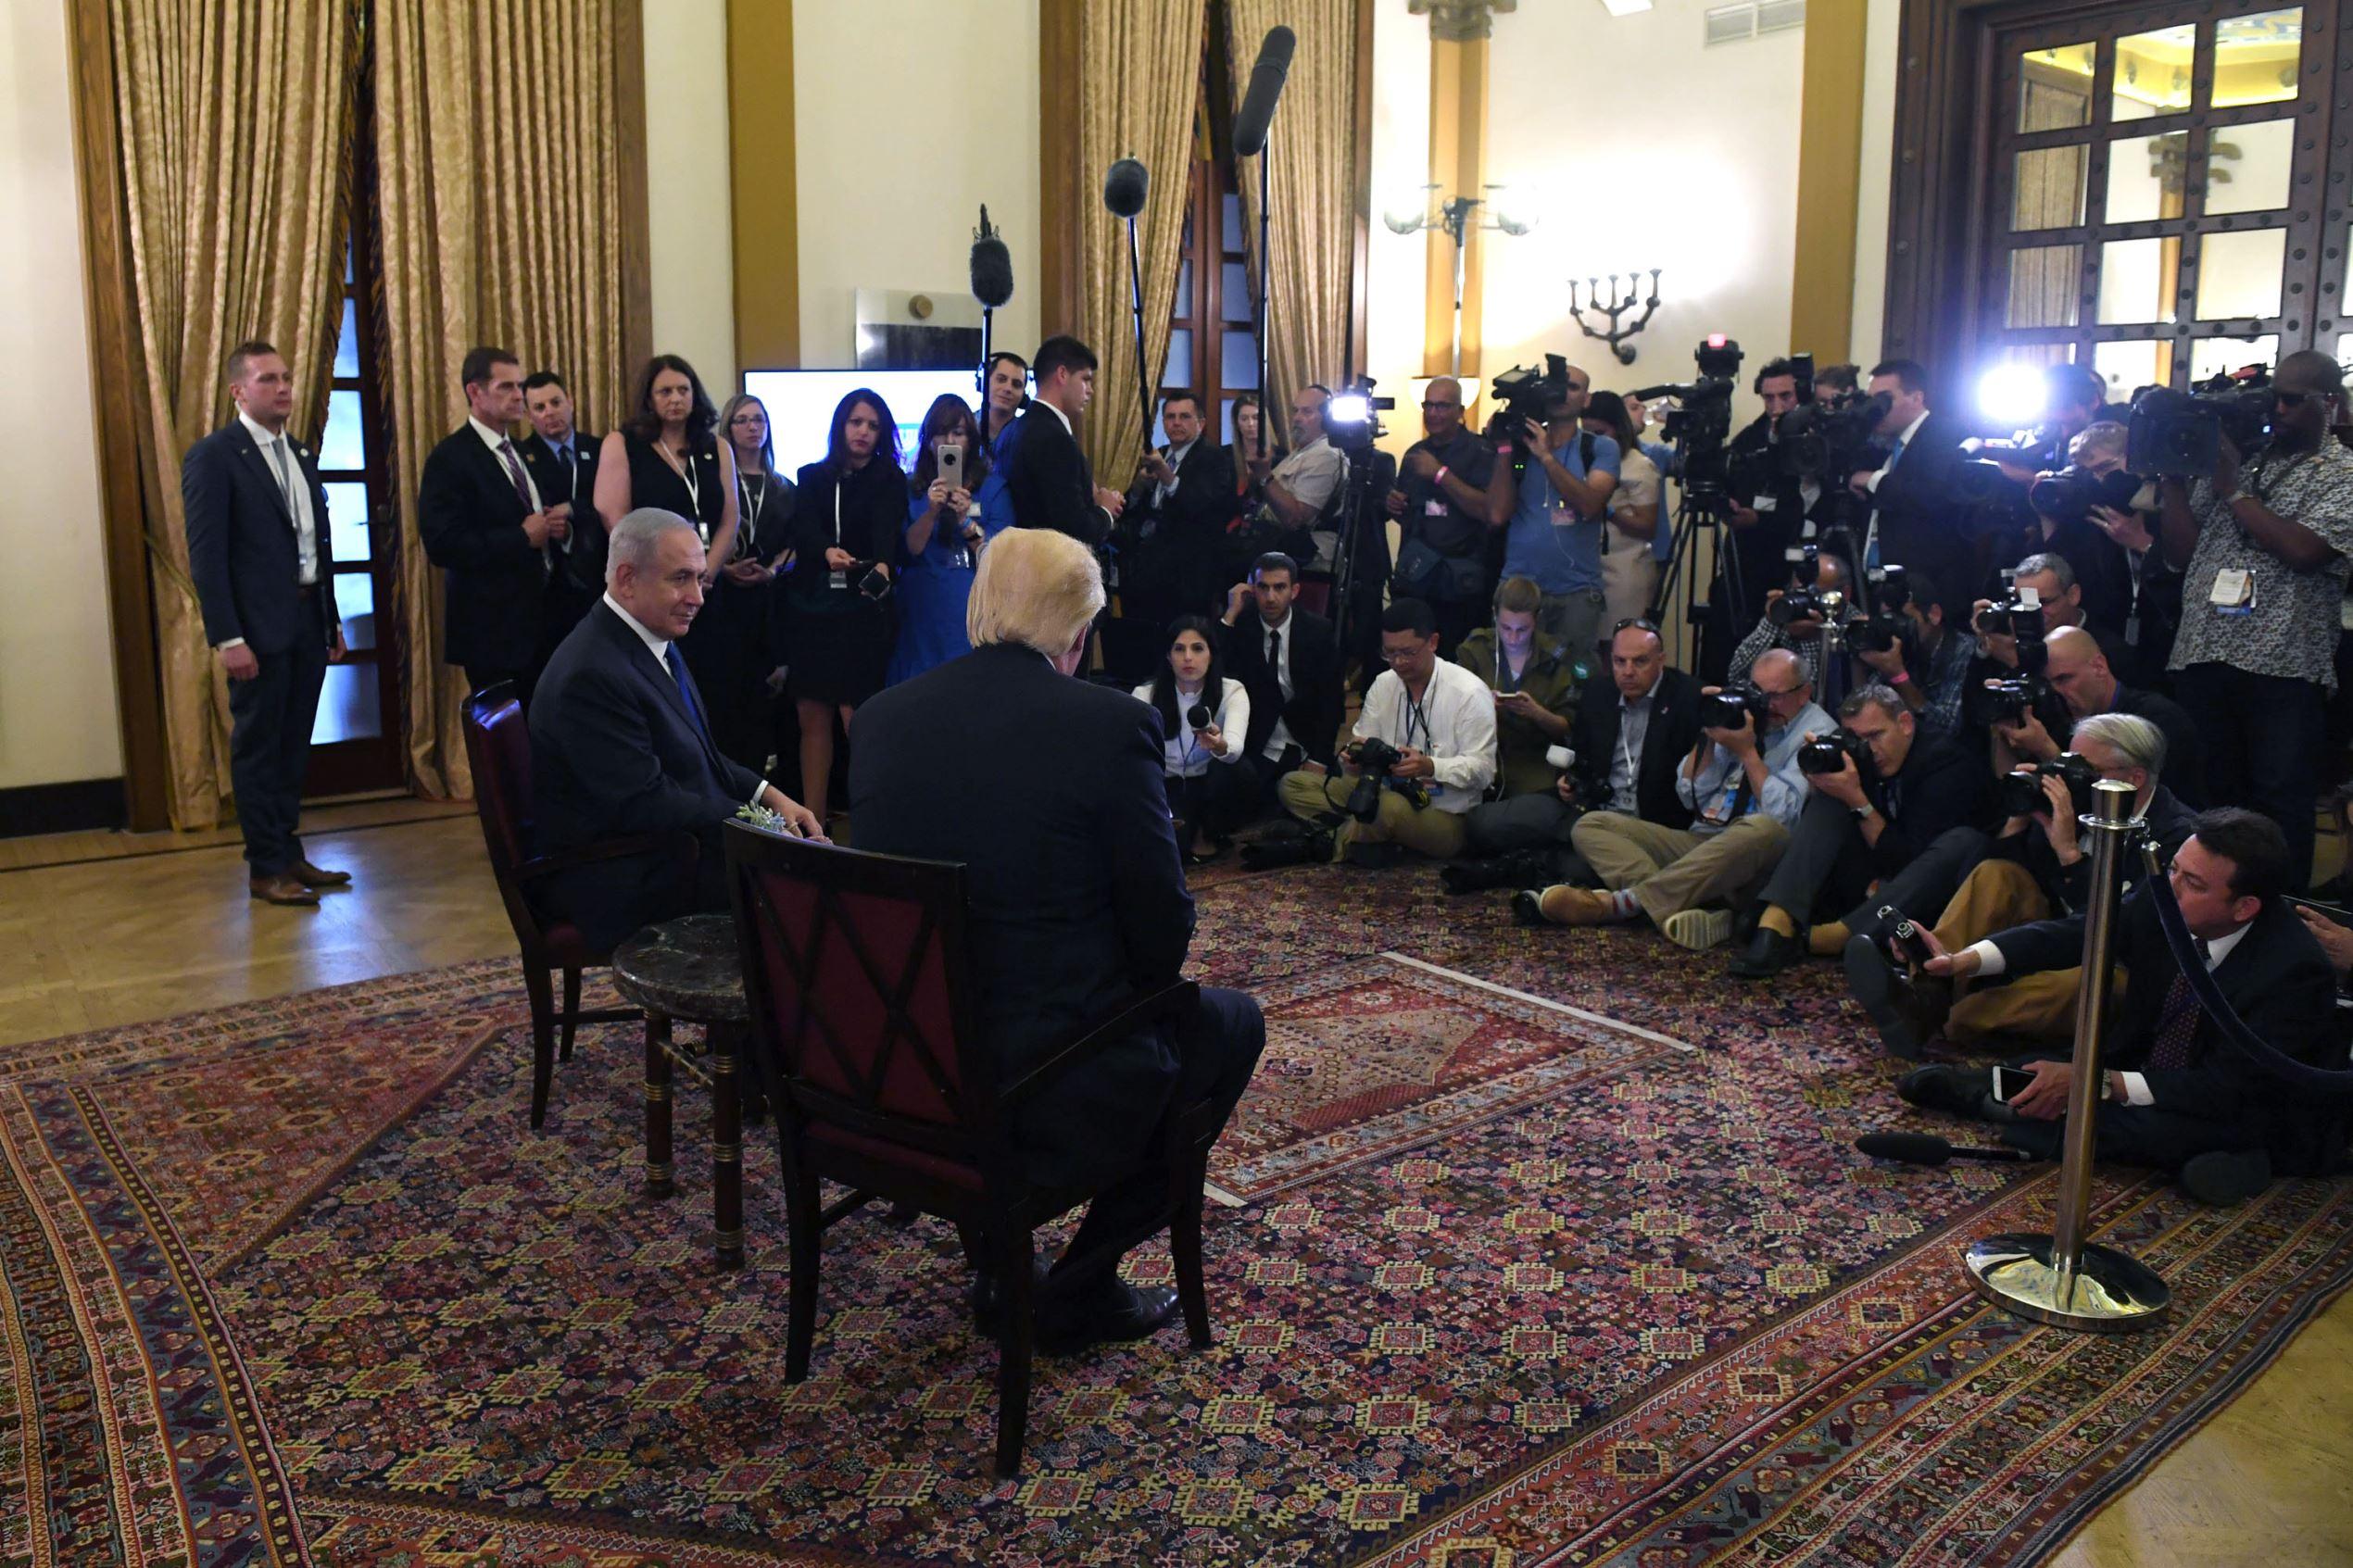 Slide 3 of 51: President Trump meets with Israel Prime Minister Benjamin Netanyahu at the King David Hotel on May 22 in Jerusalem.